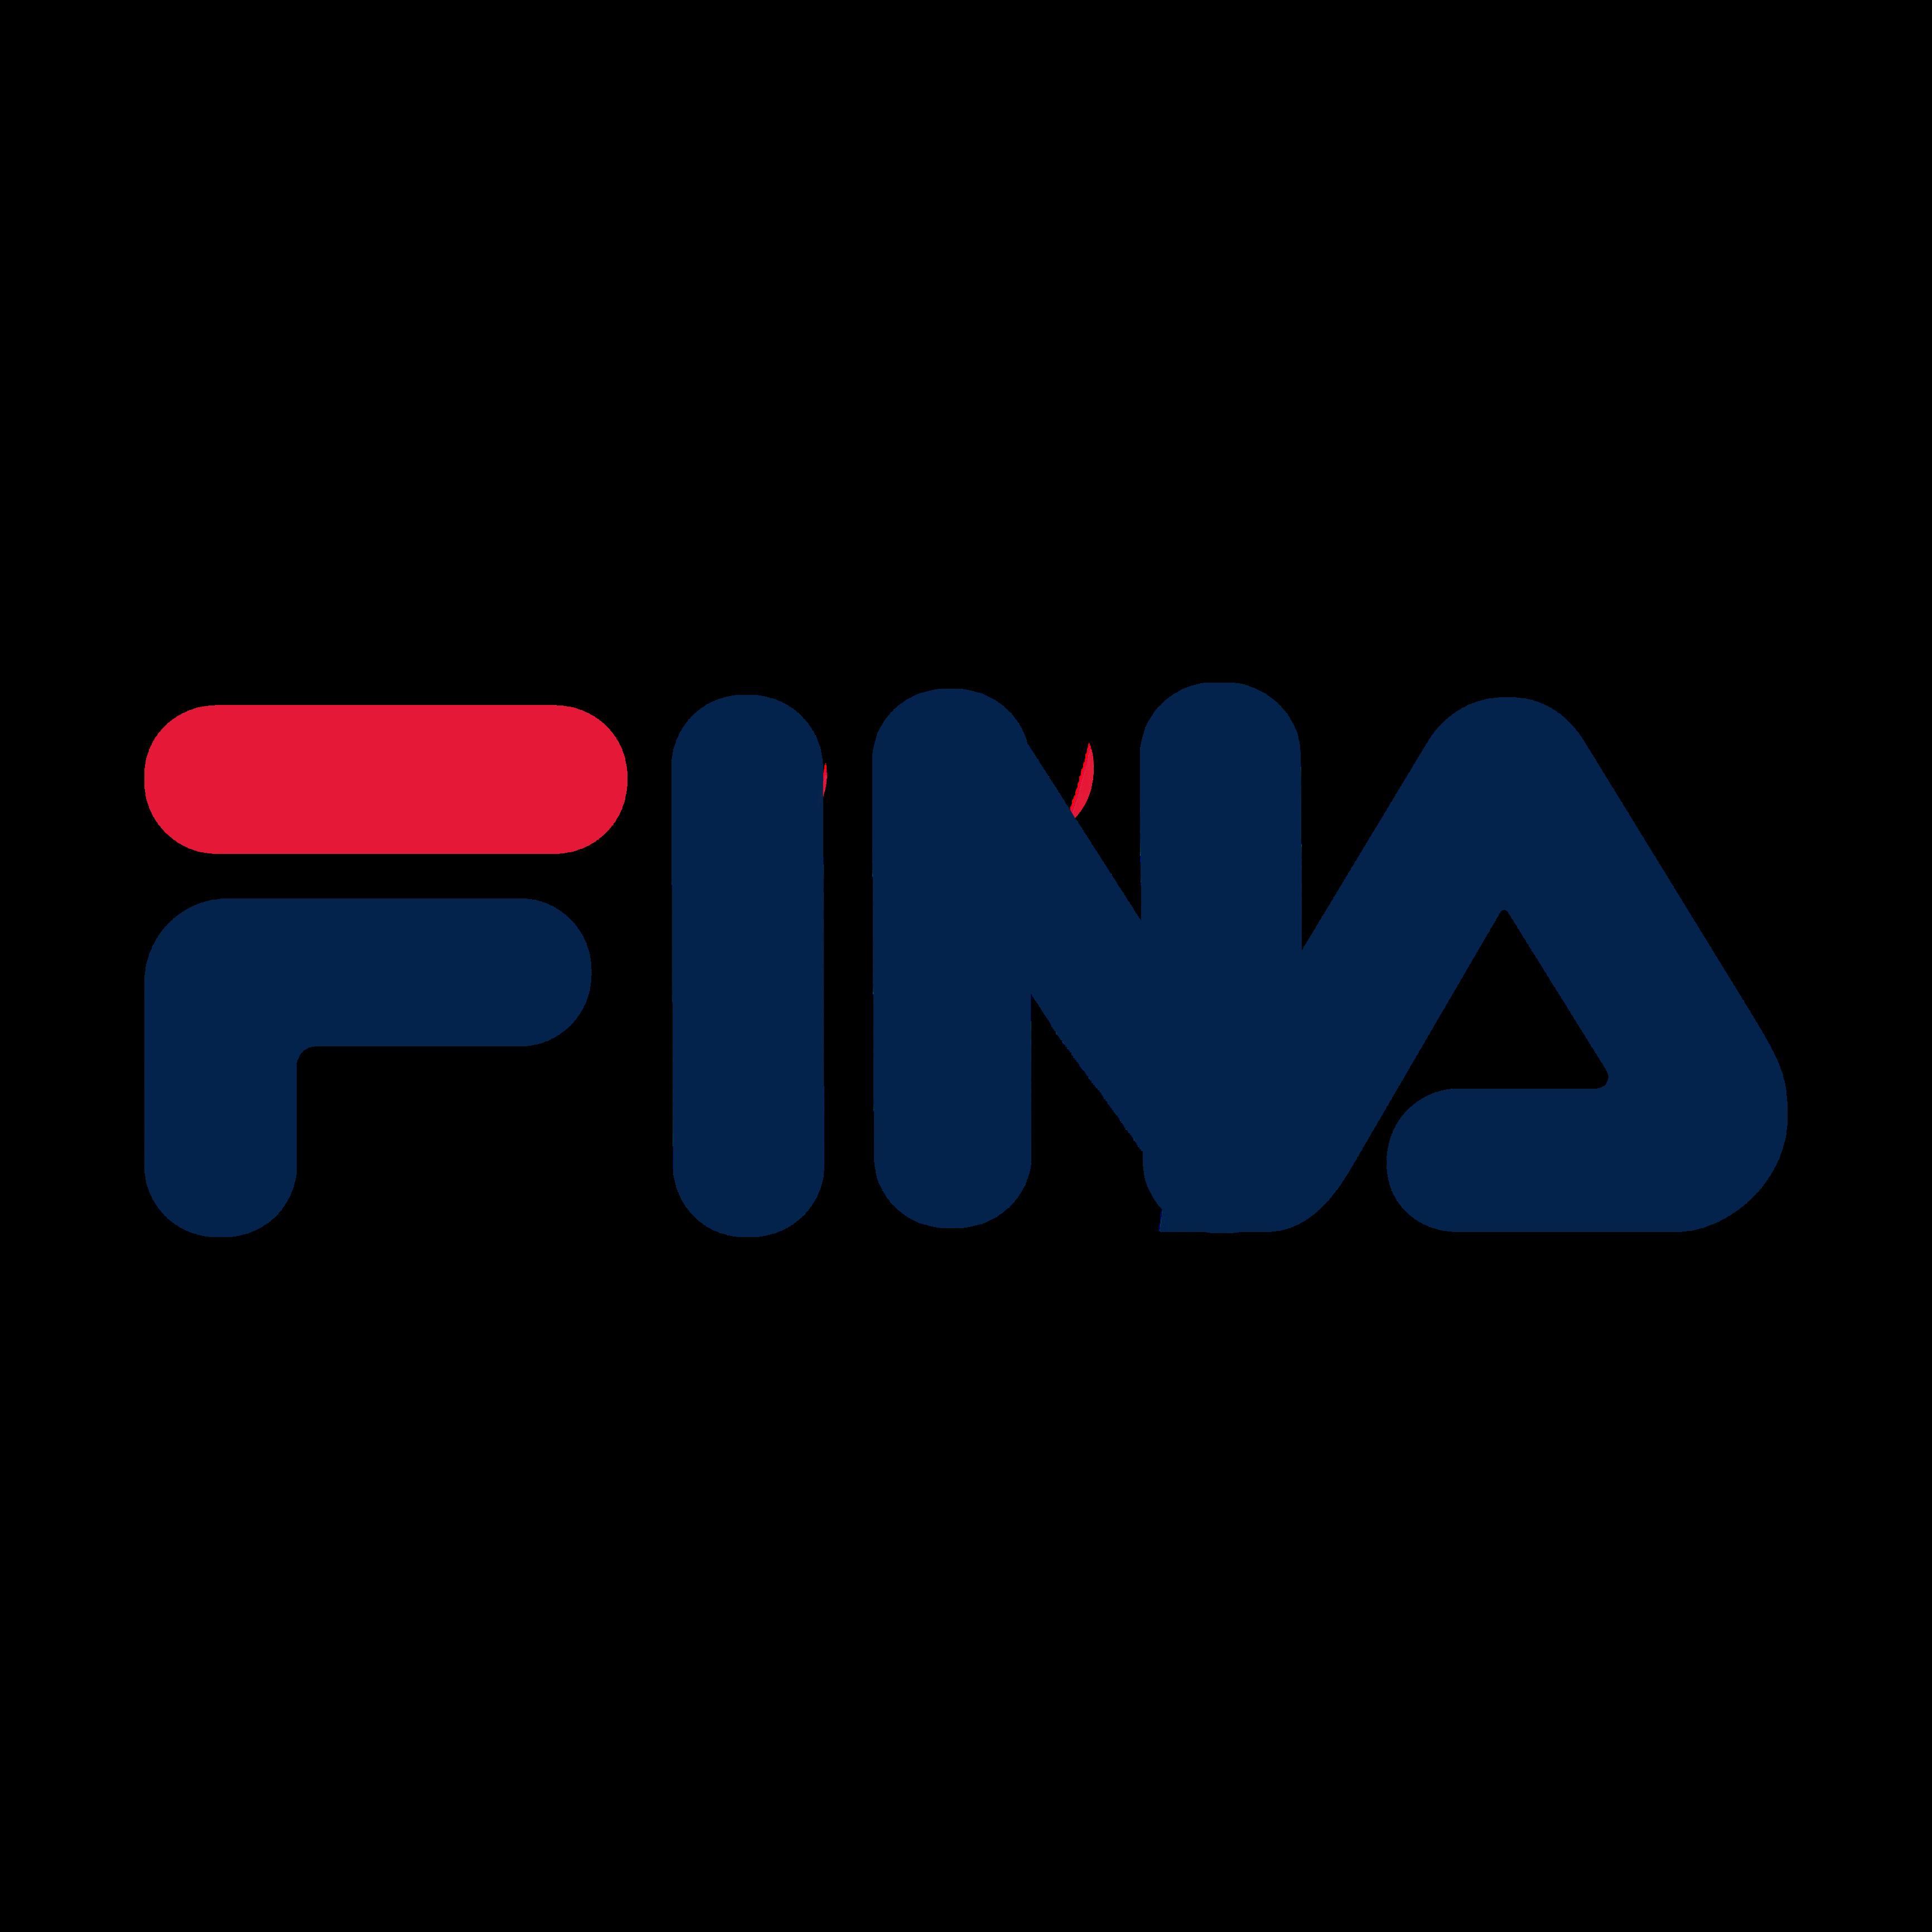 Fina Fila Tenis Logomarca Logo Fila